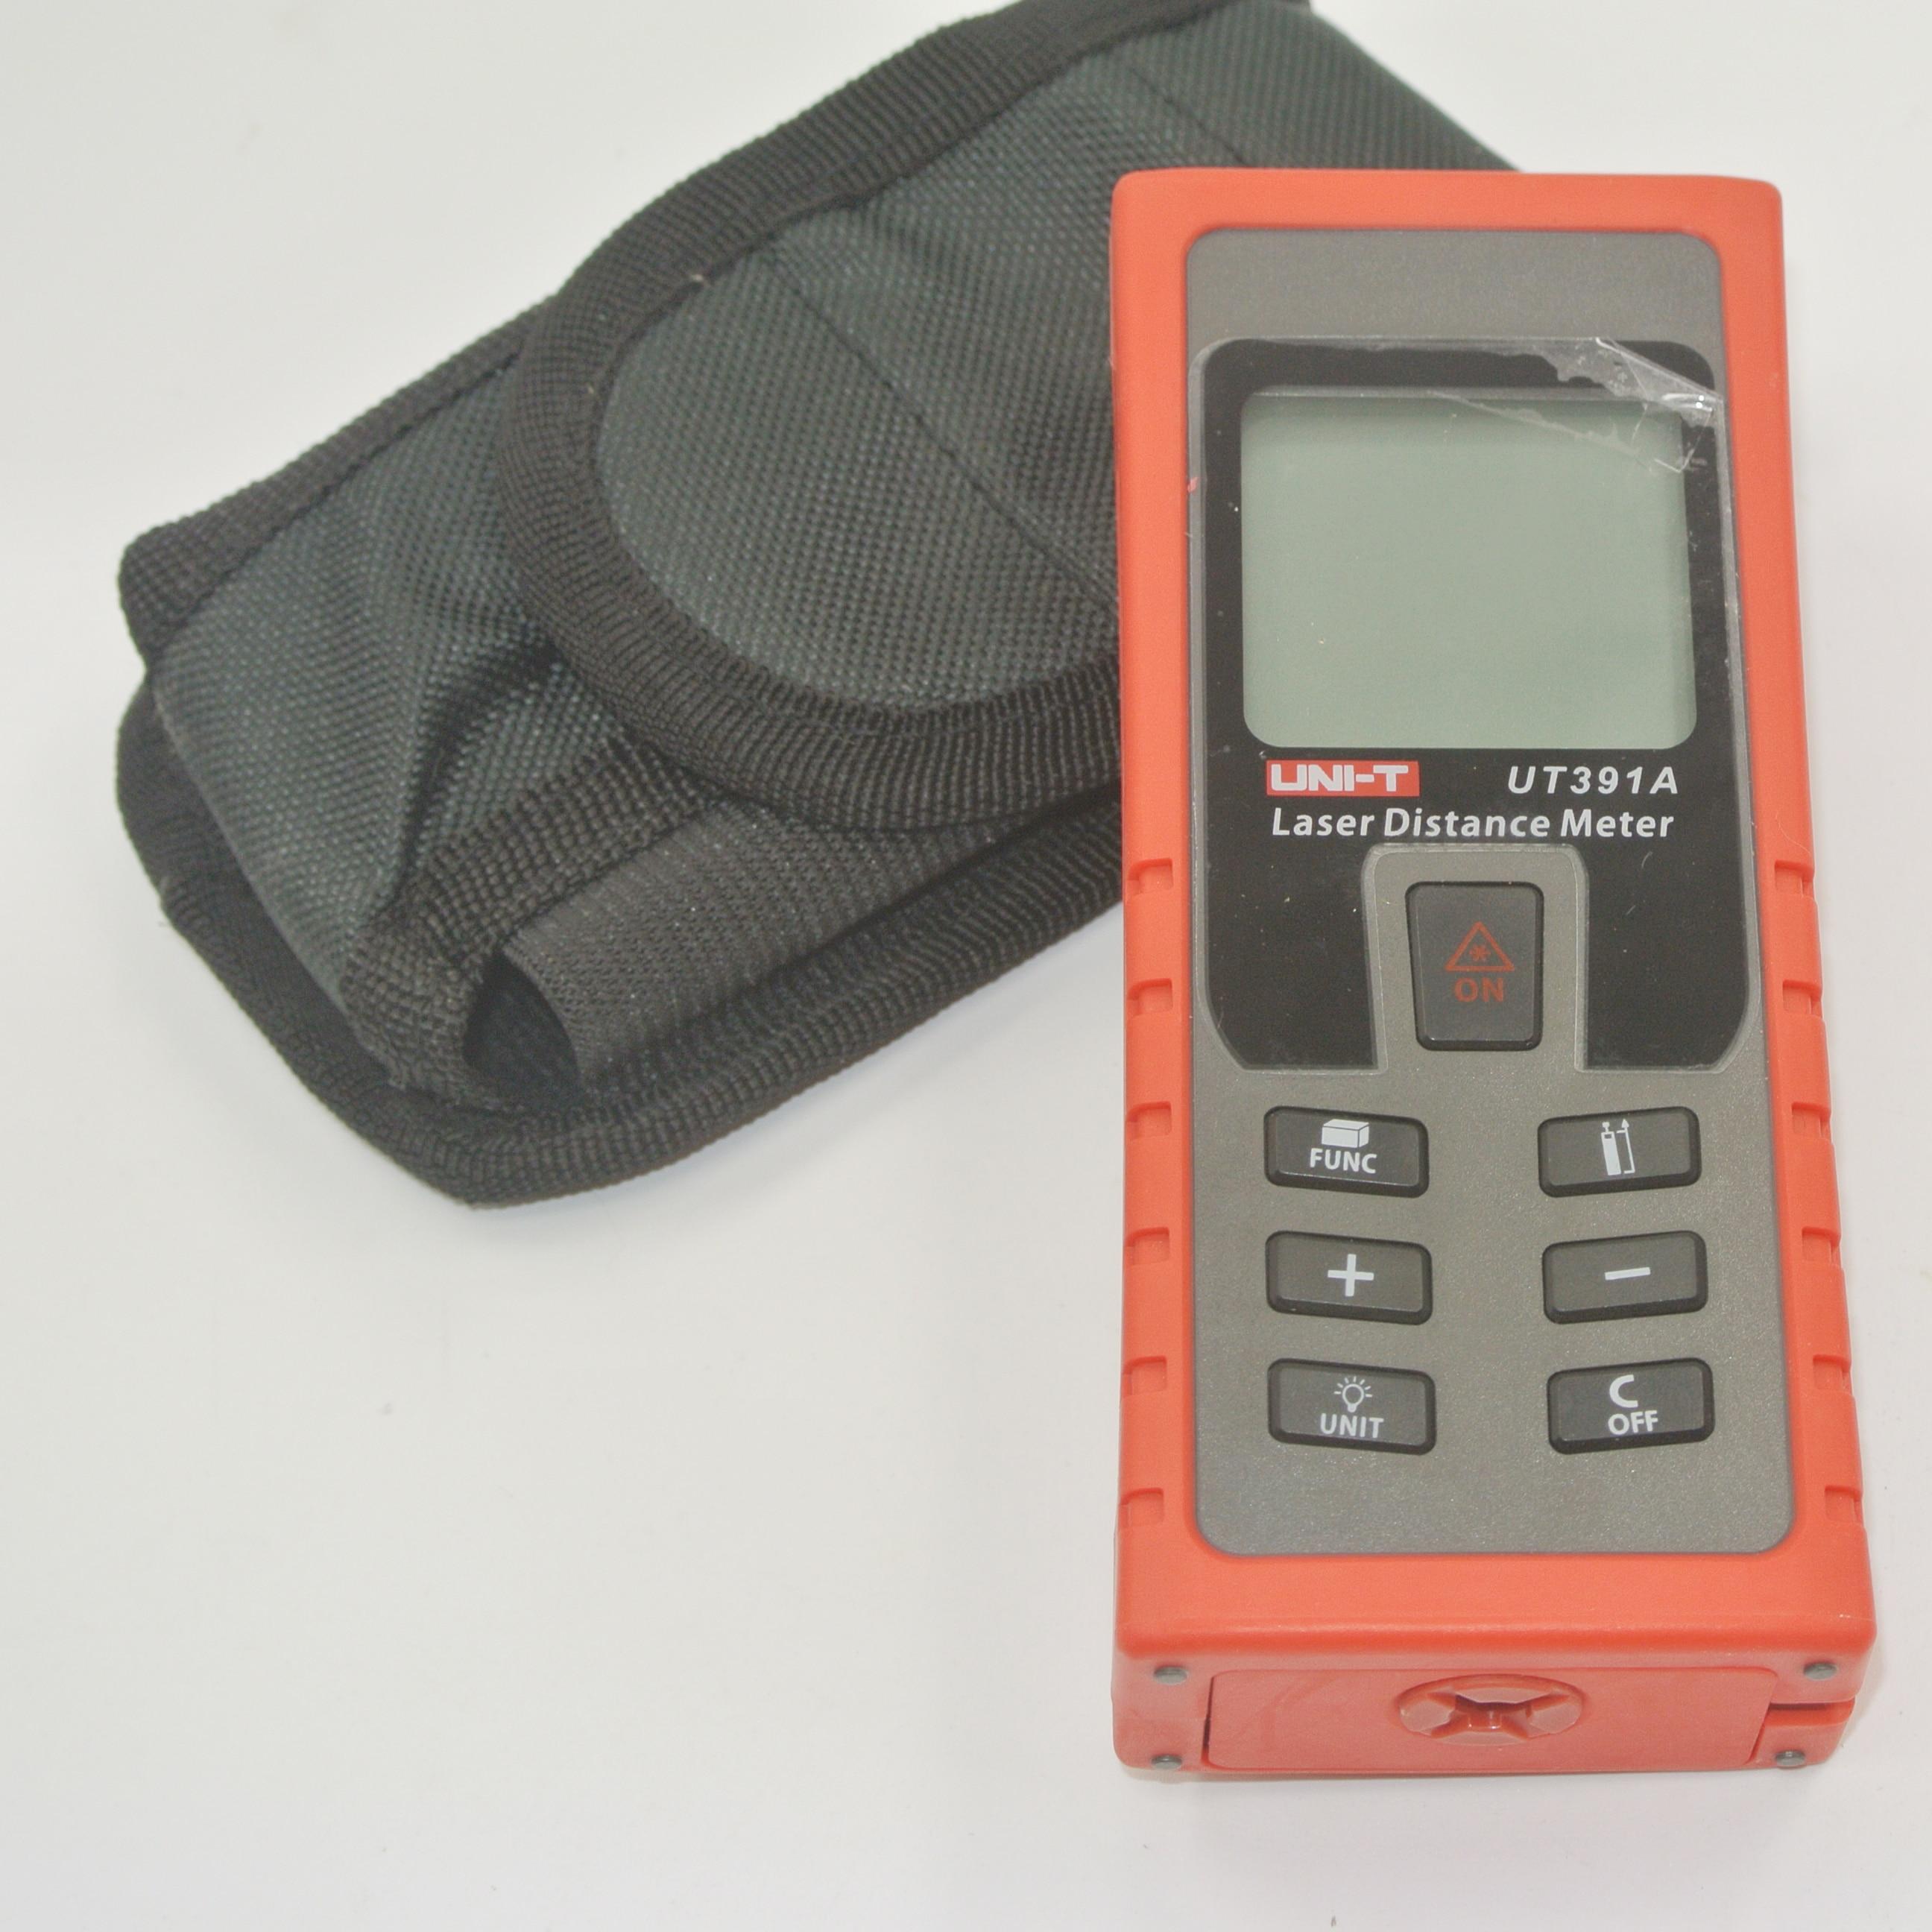 UT391A Handheld Laser Distance Meter Finder Measure 0.1m to 70 meter 4in-229f  Measure 80m/262ft B0033 светильник потолочный эра kl led 5